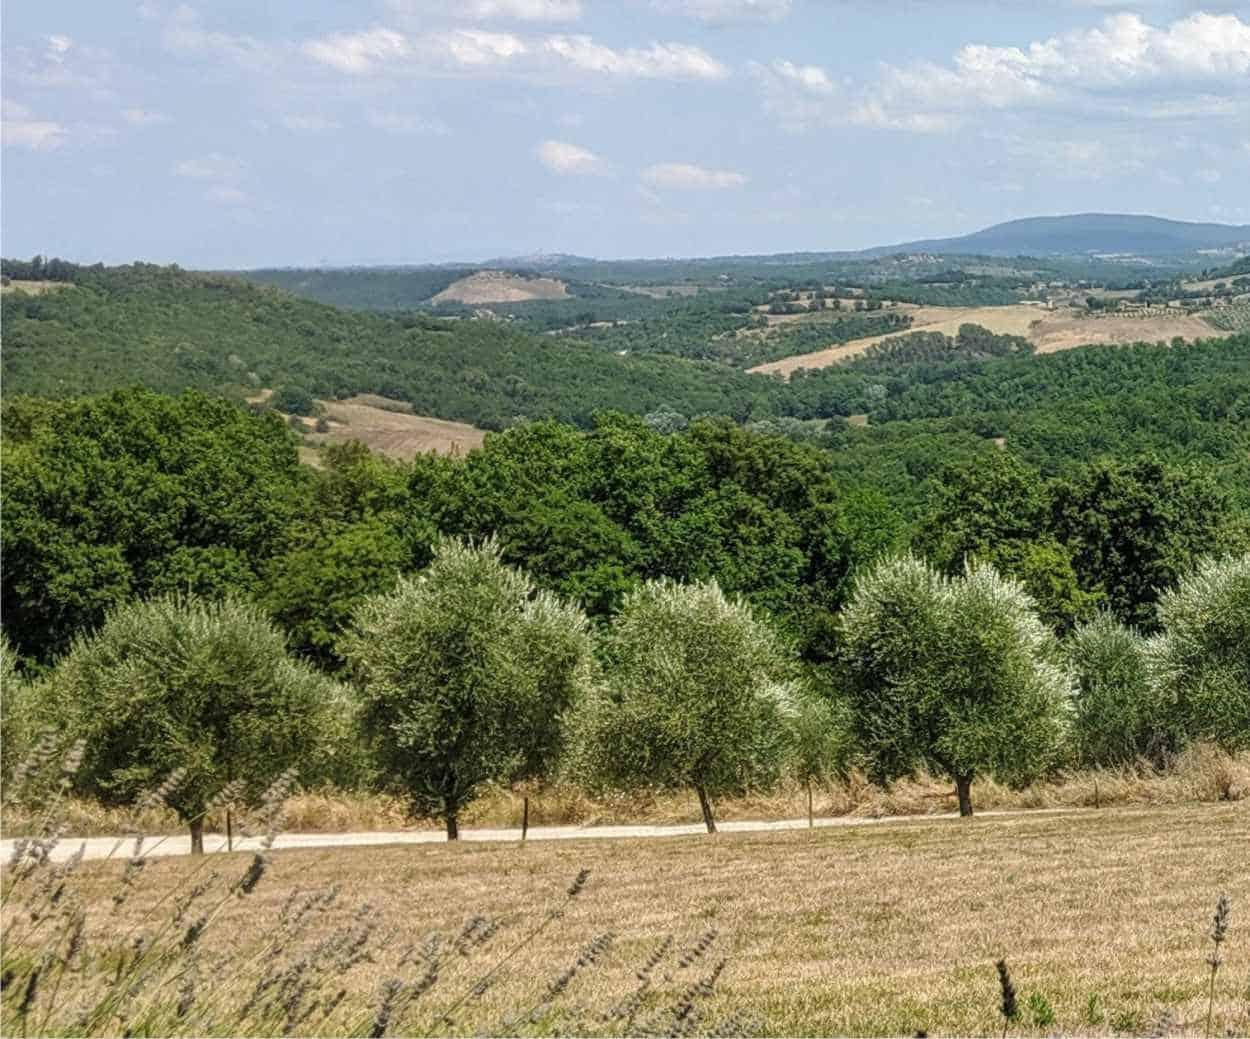 olivi toscana